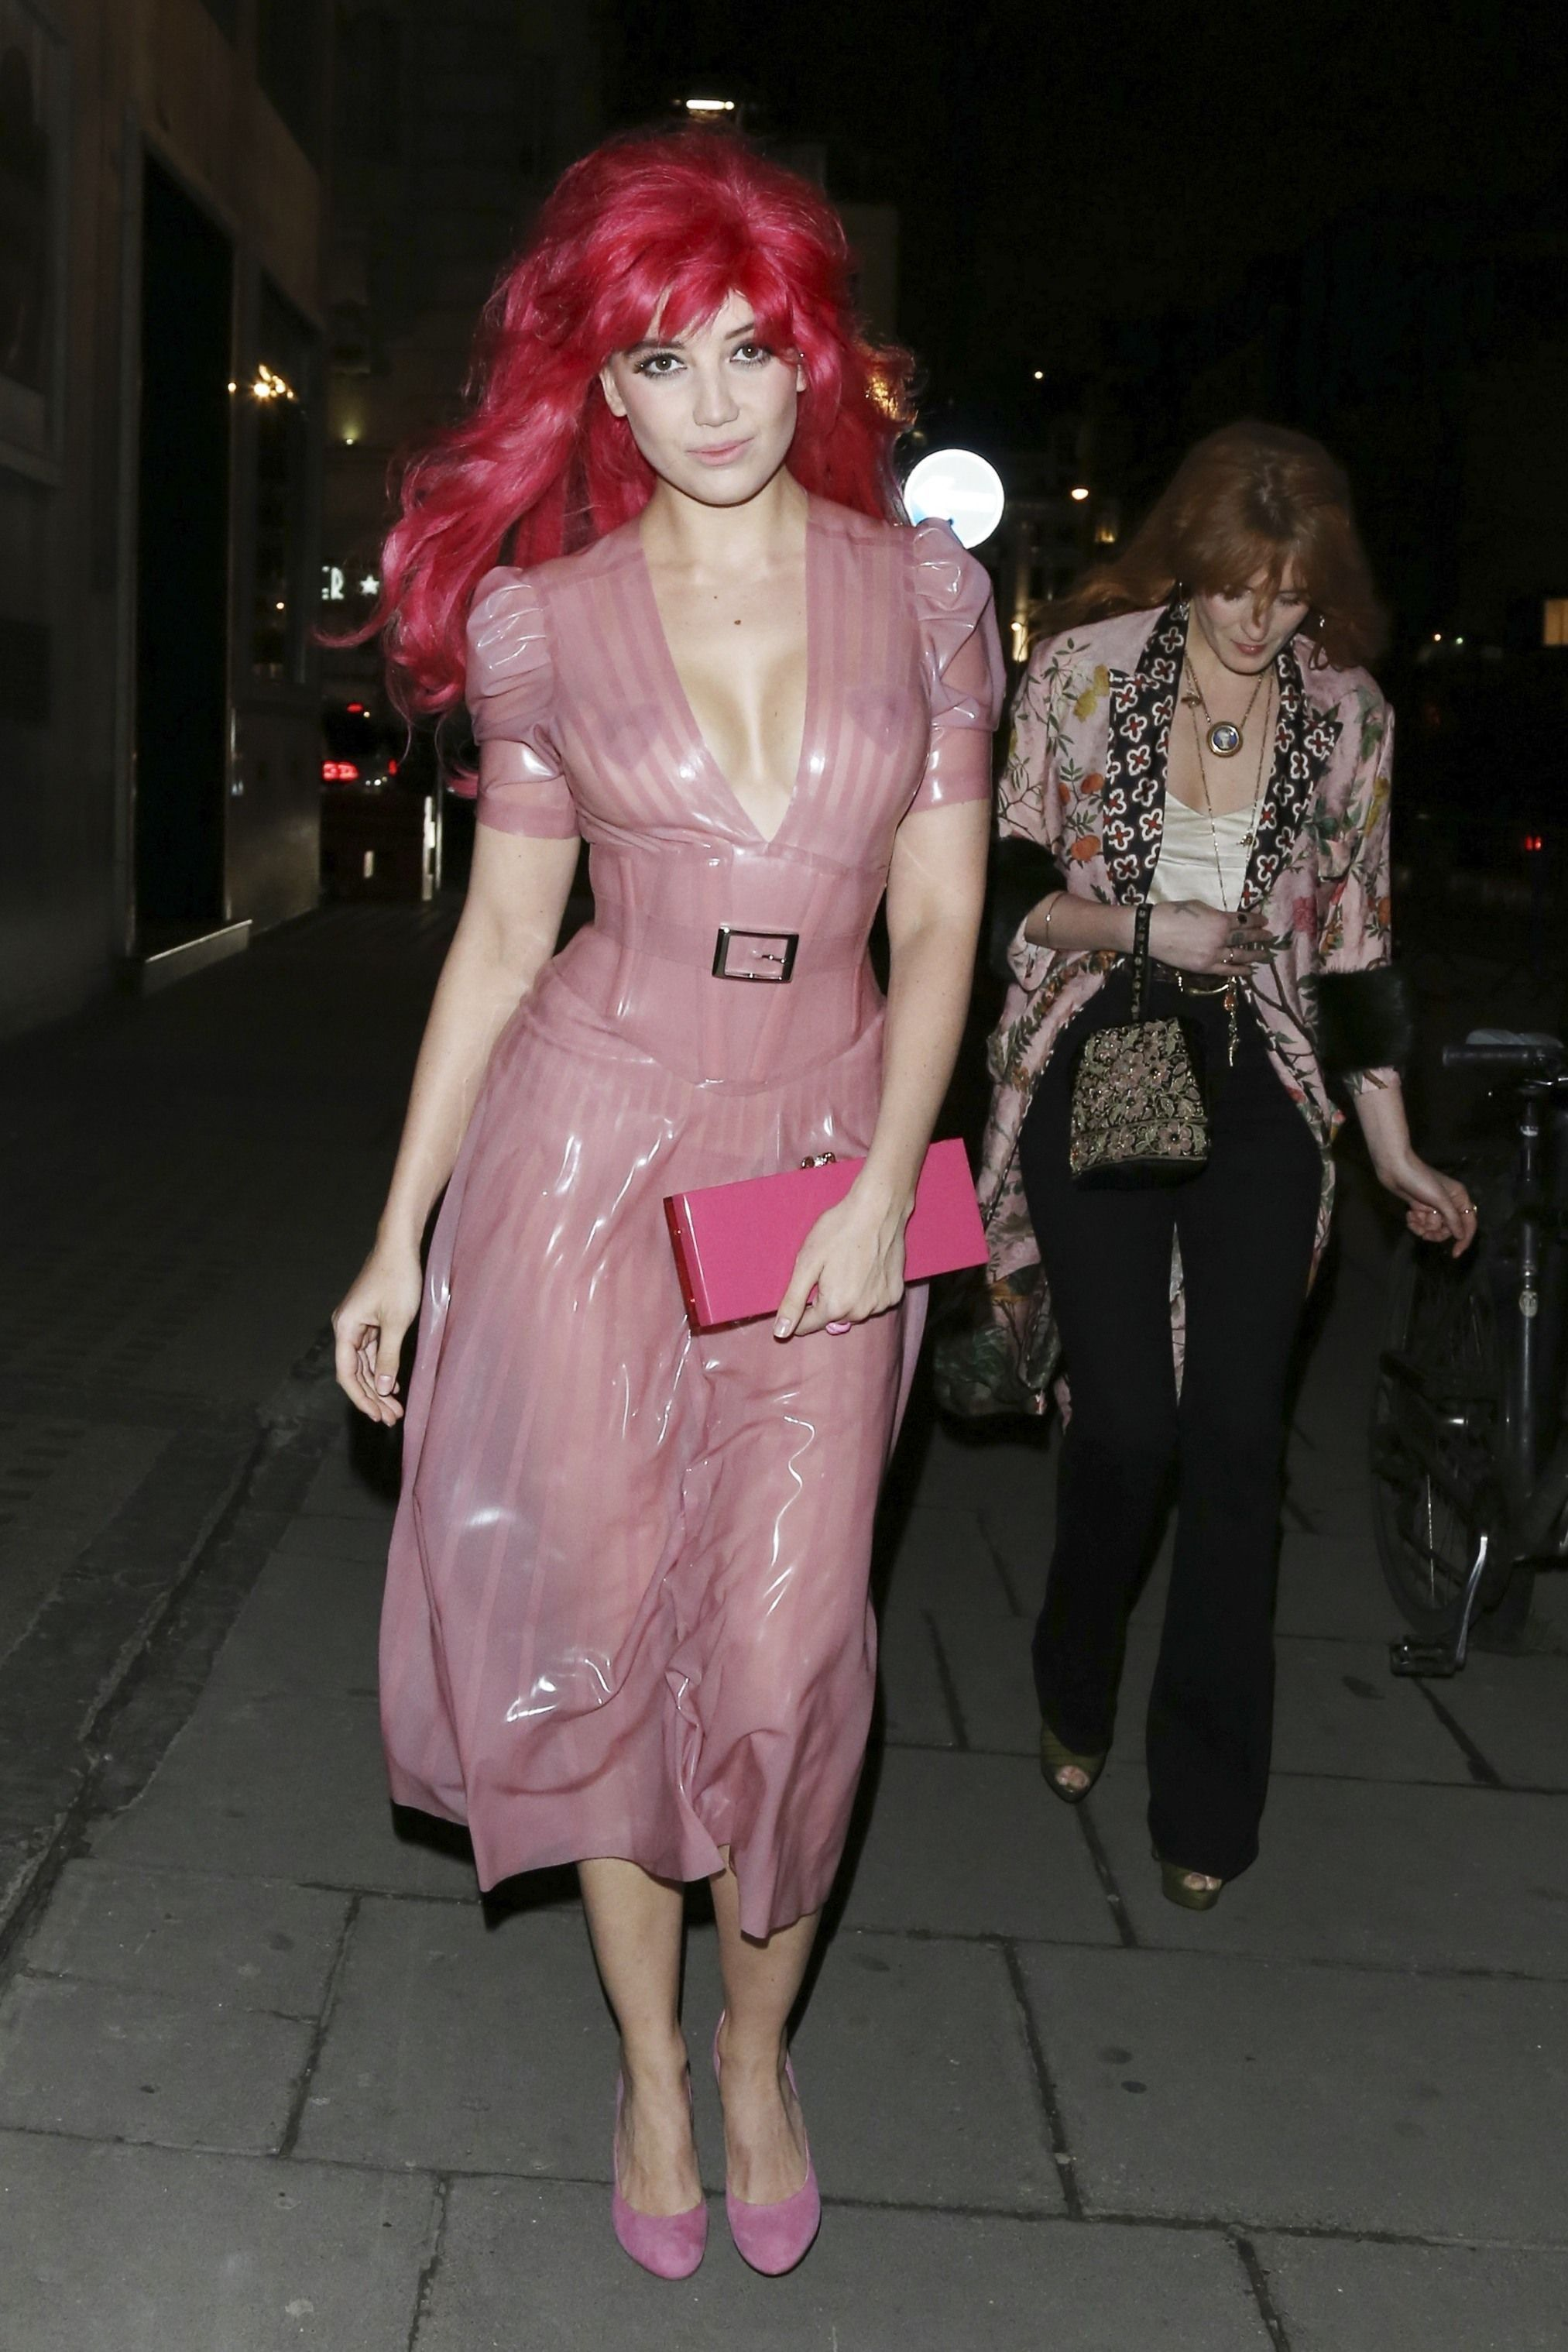 Daisy Lowe nipples exposed